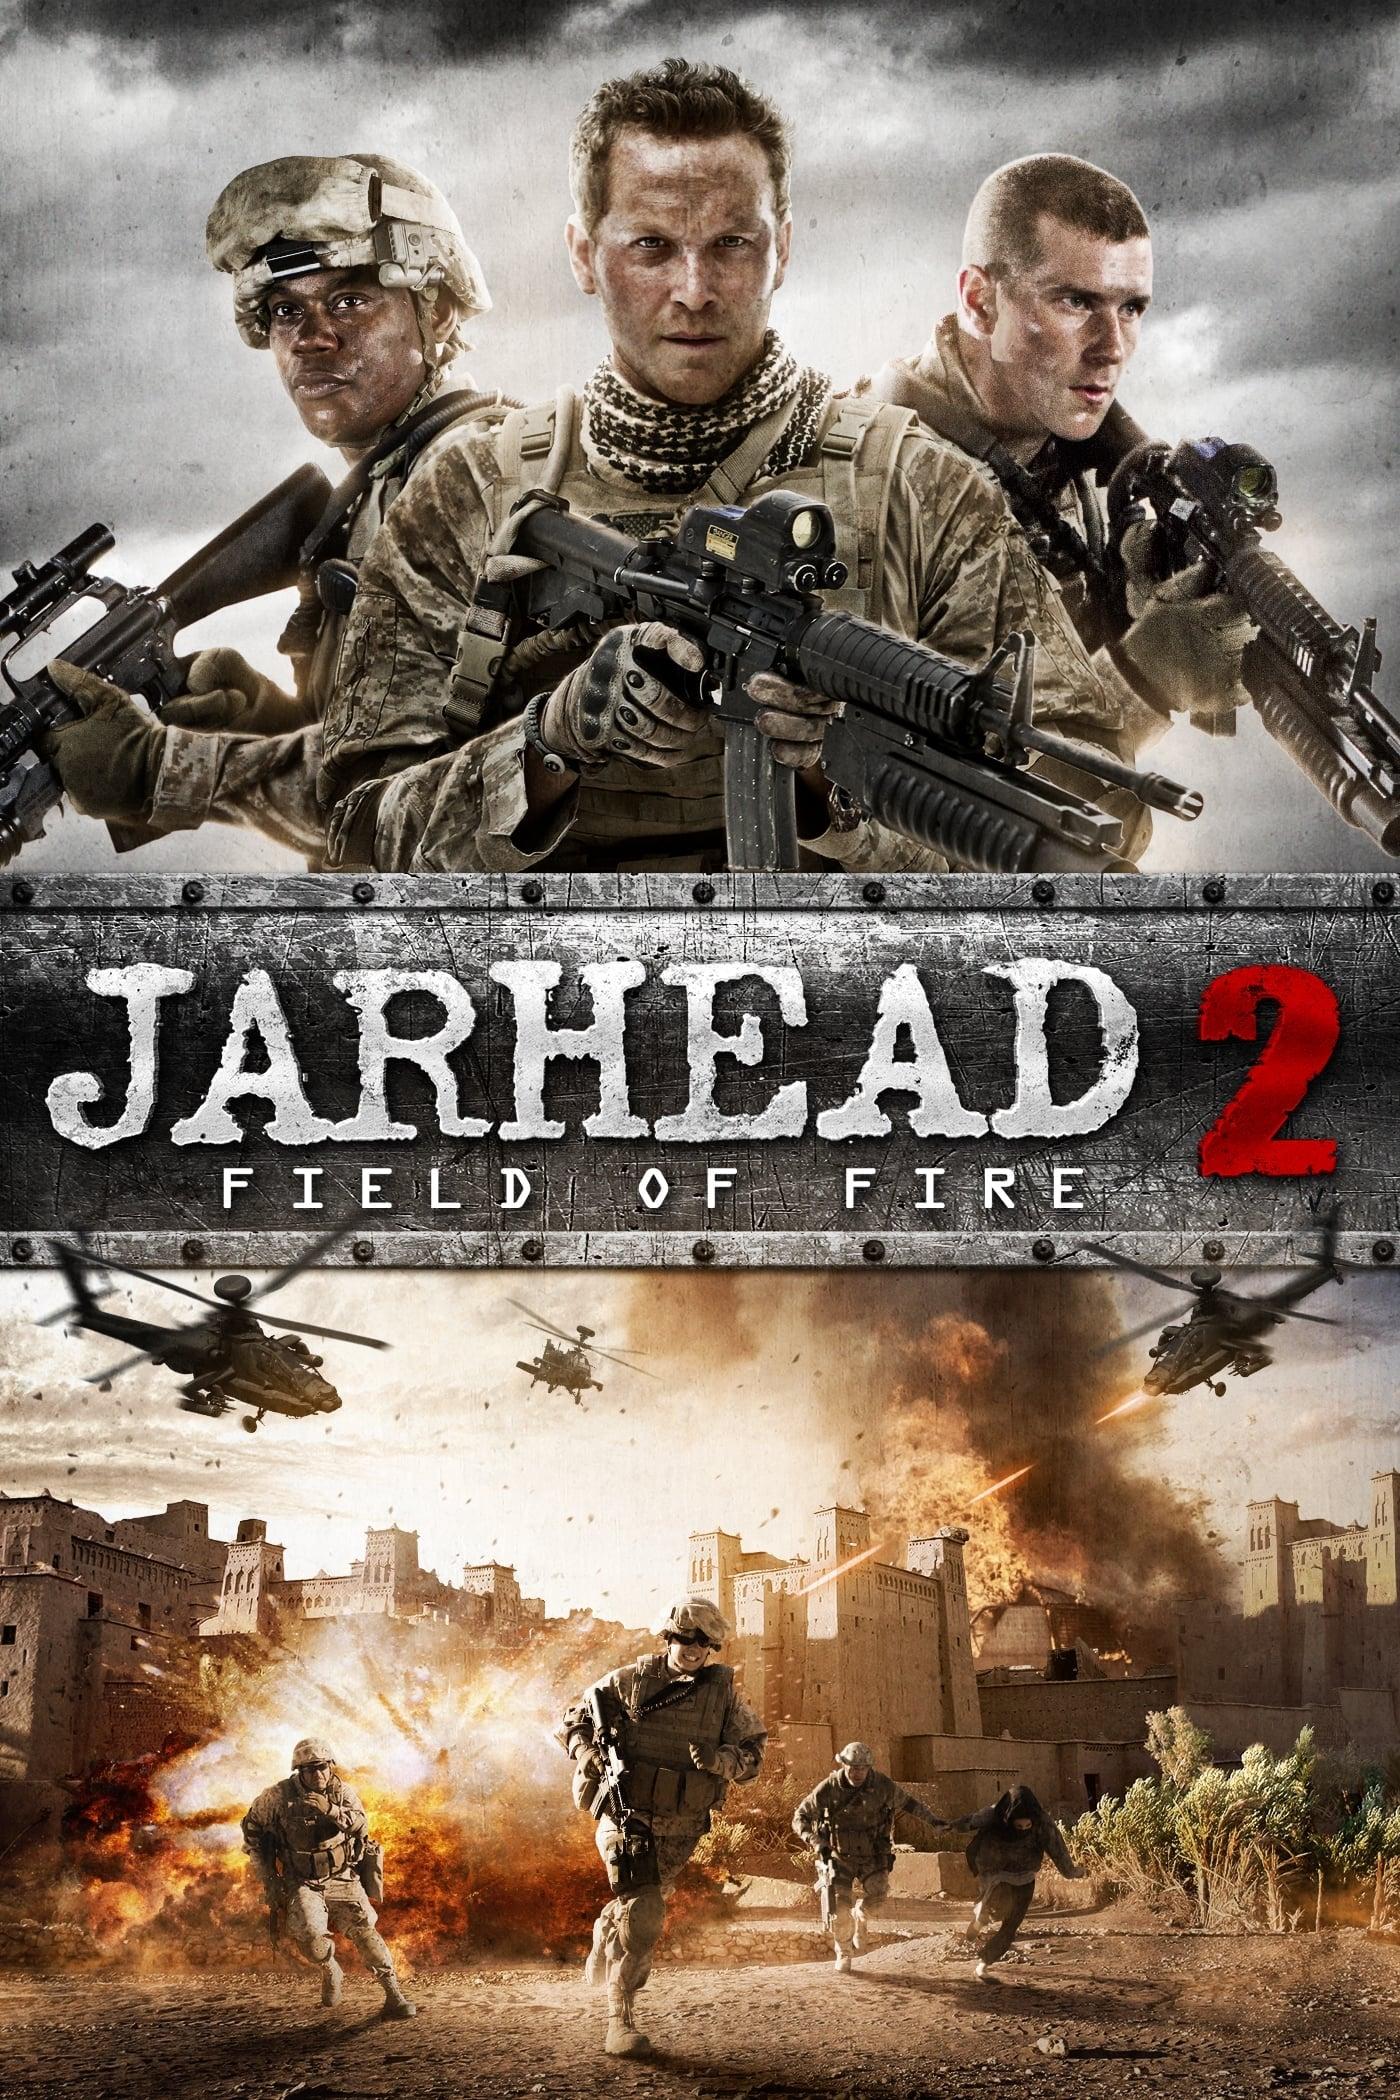 Jarhead 2 : Field of Fire streaming sur libertyvf